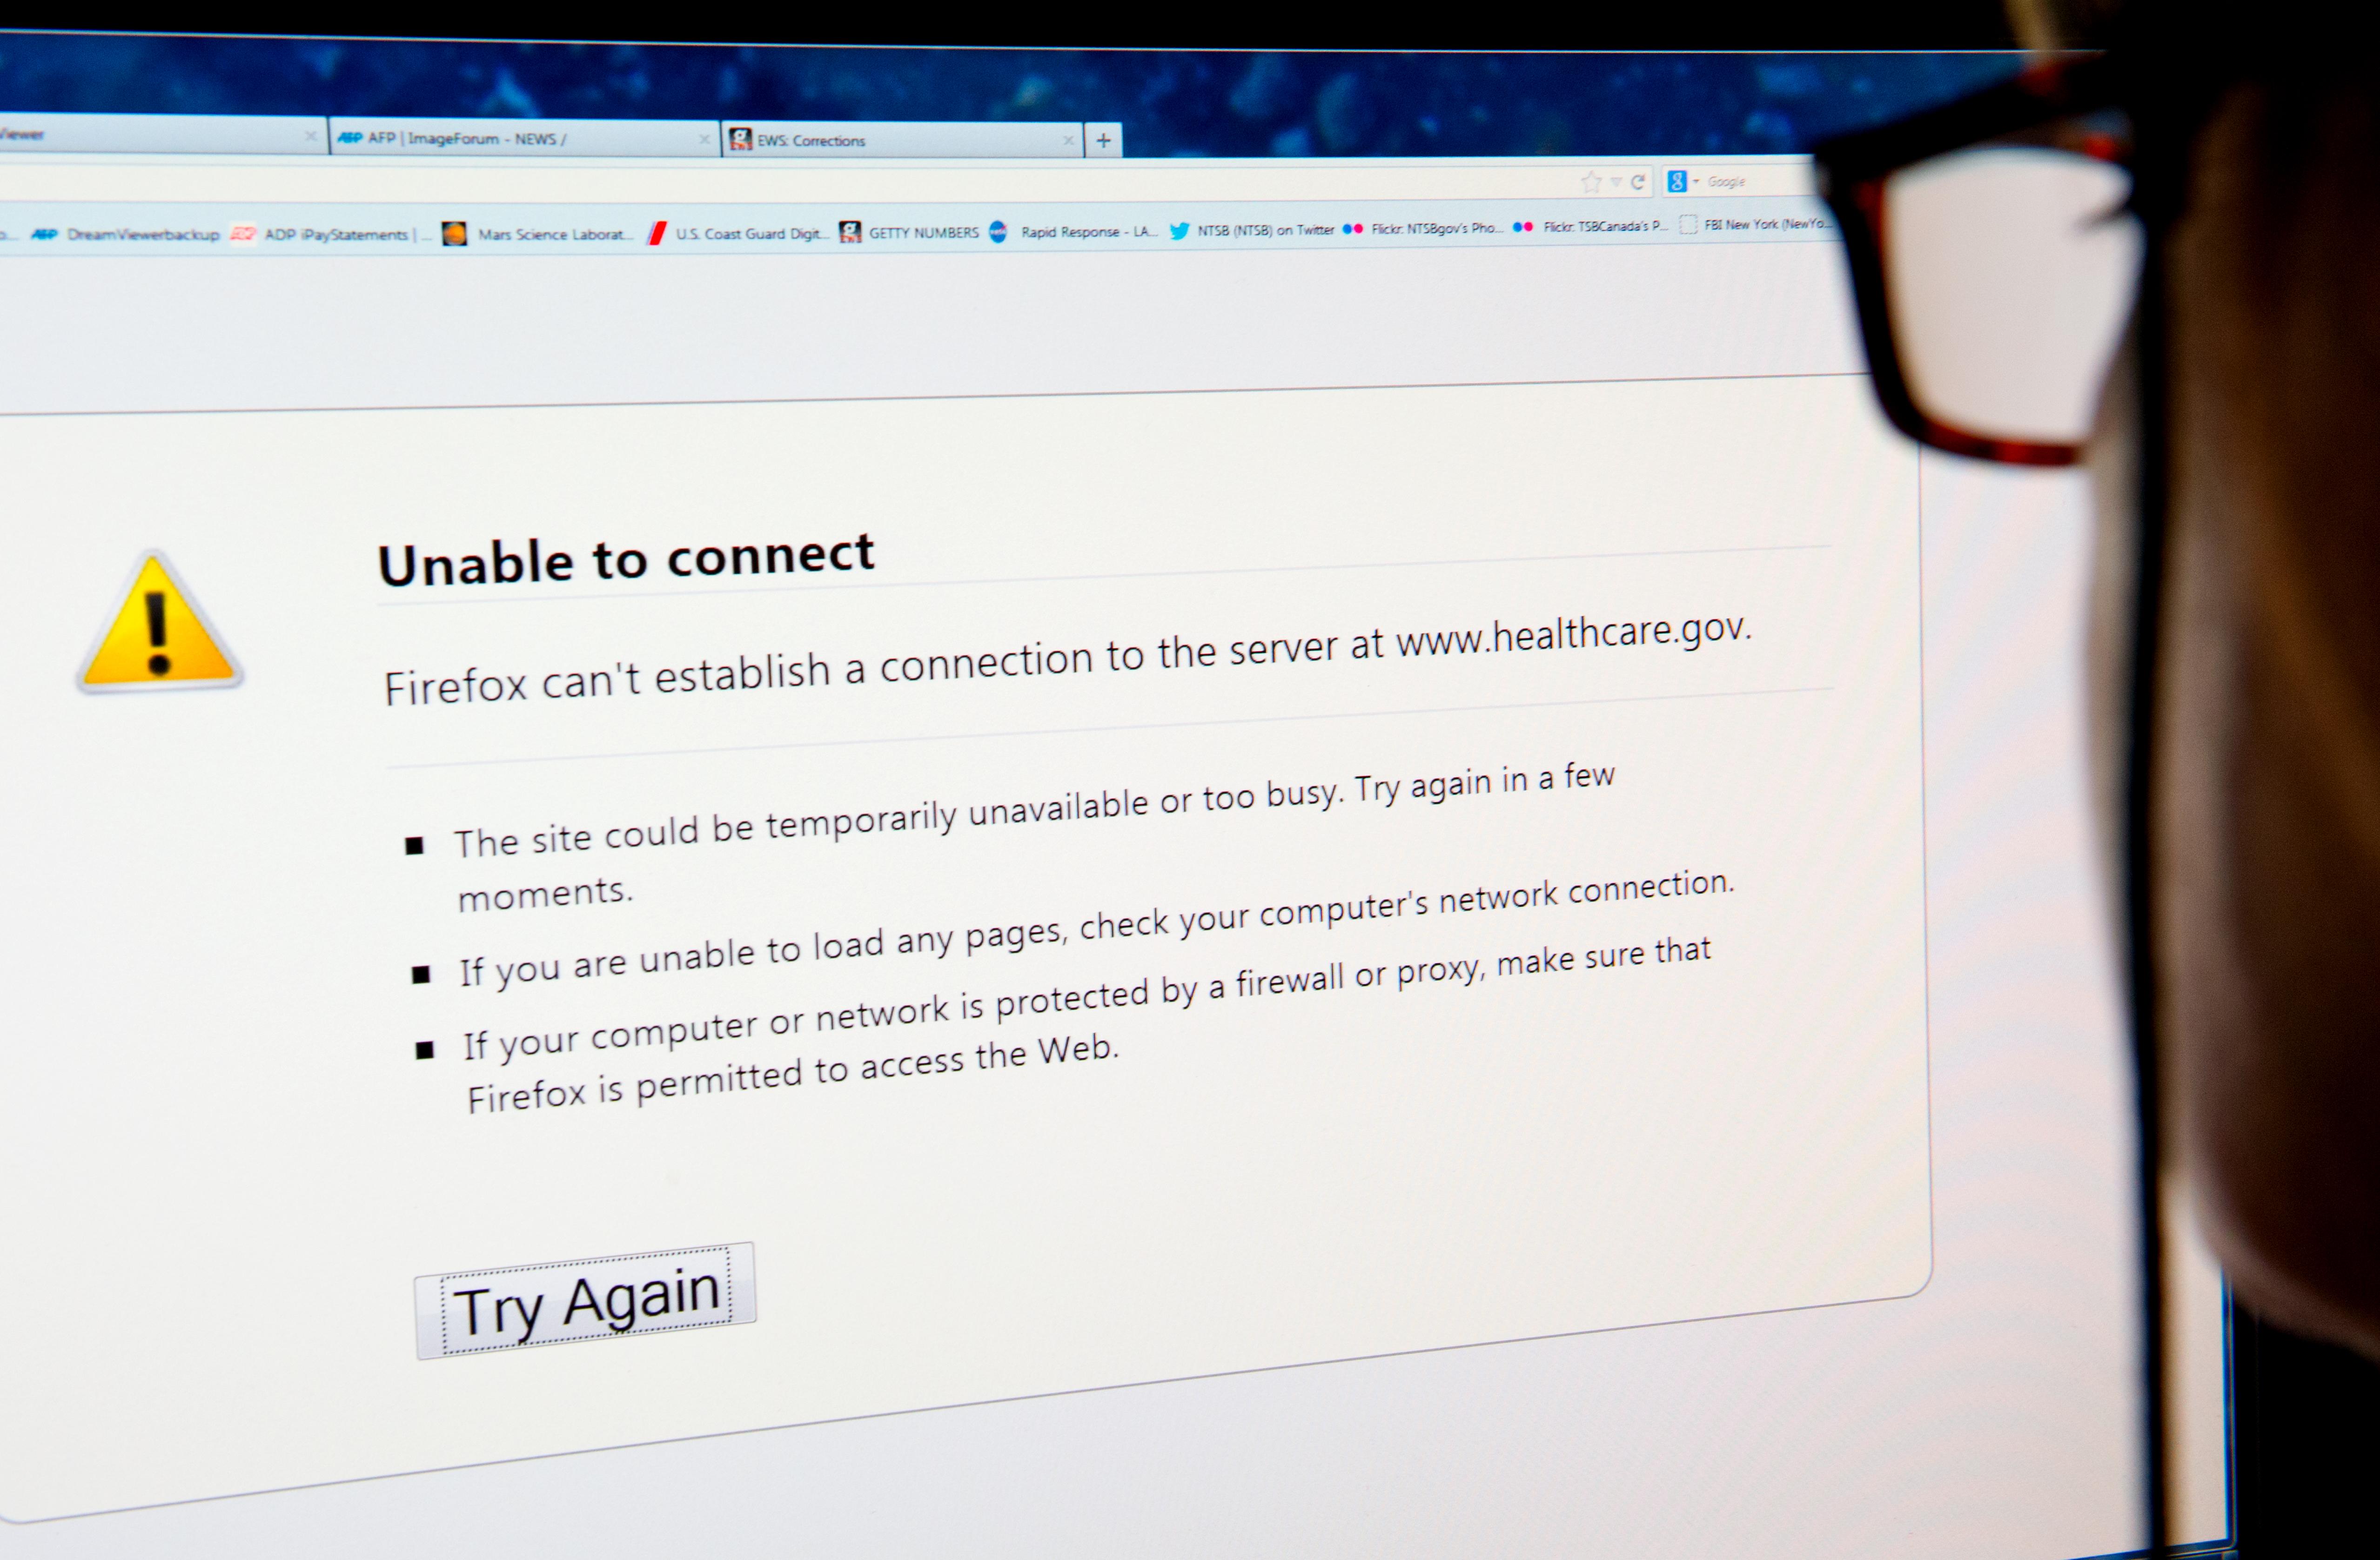 16 Millionen E-Mail-Konten geknackt